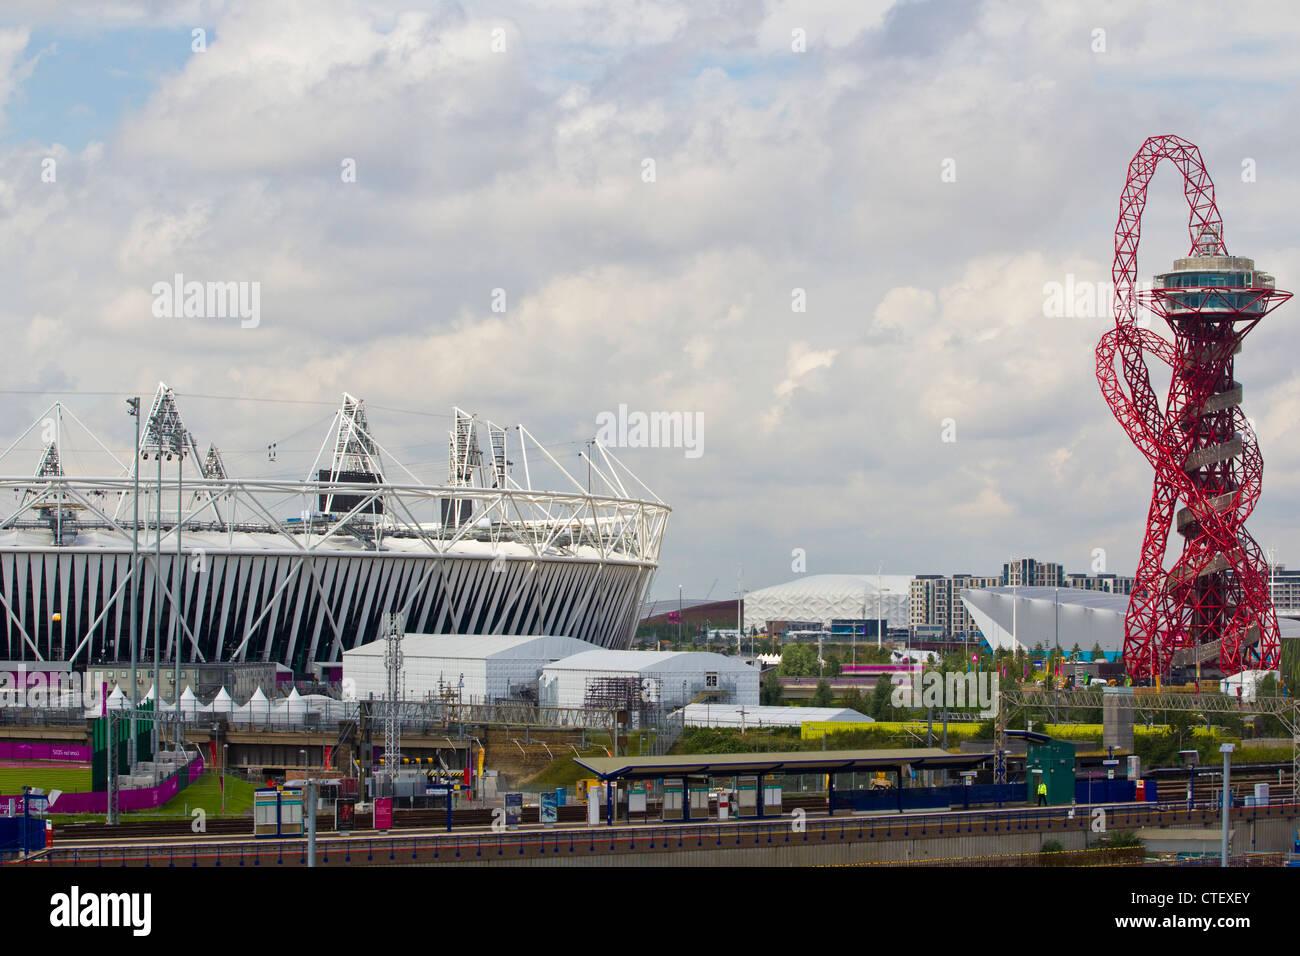 Anish Kapoor's Orbit sculpture rises above the Olympic Park, Stratford, East London, UK - Stock Image